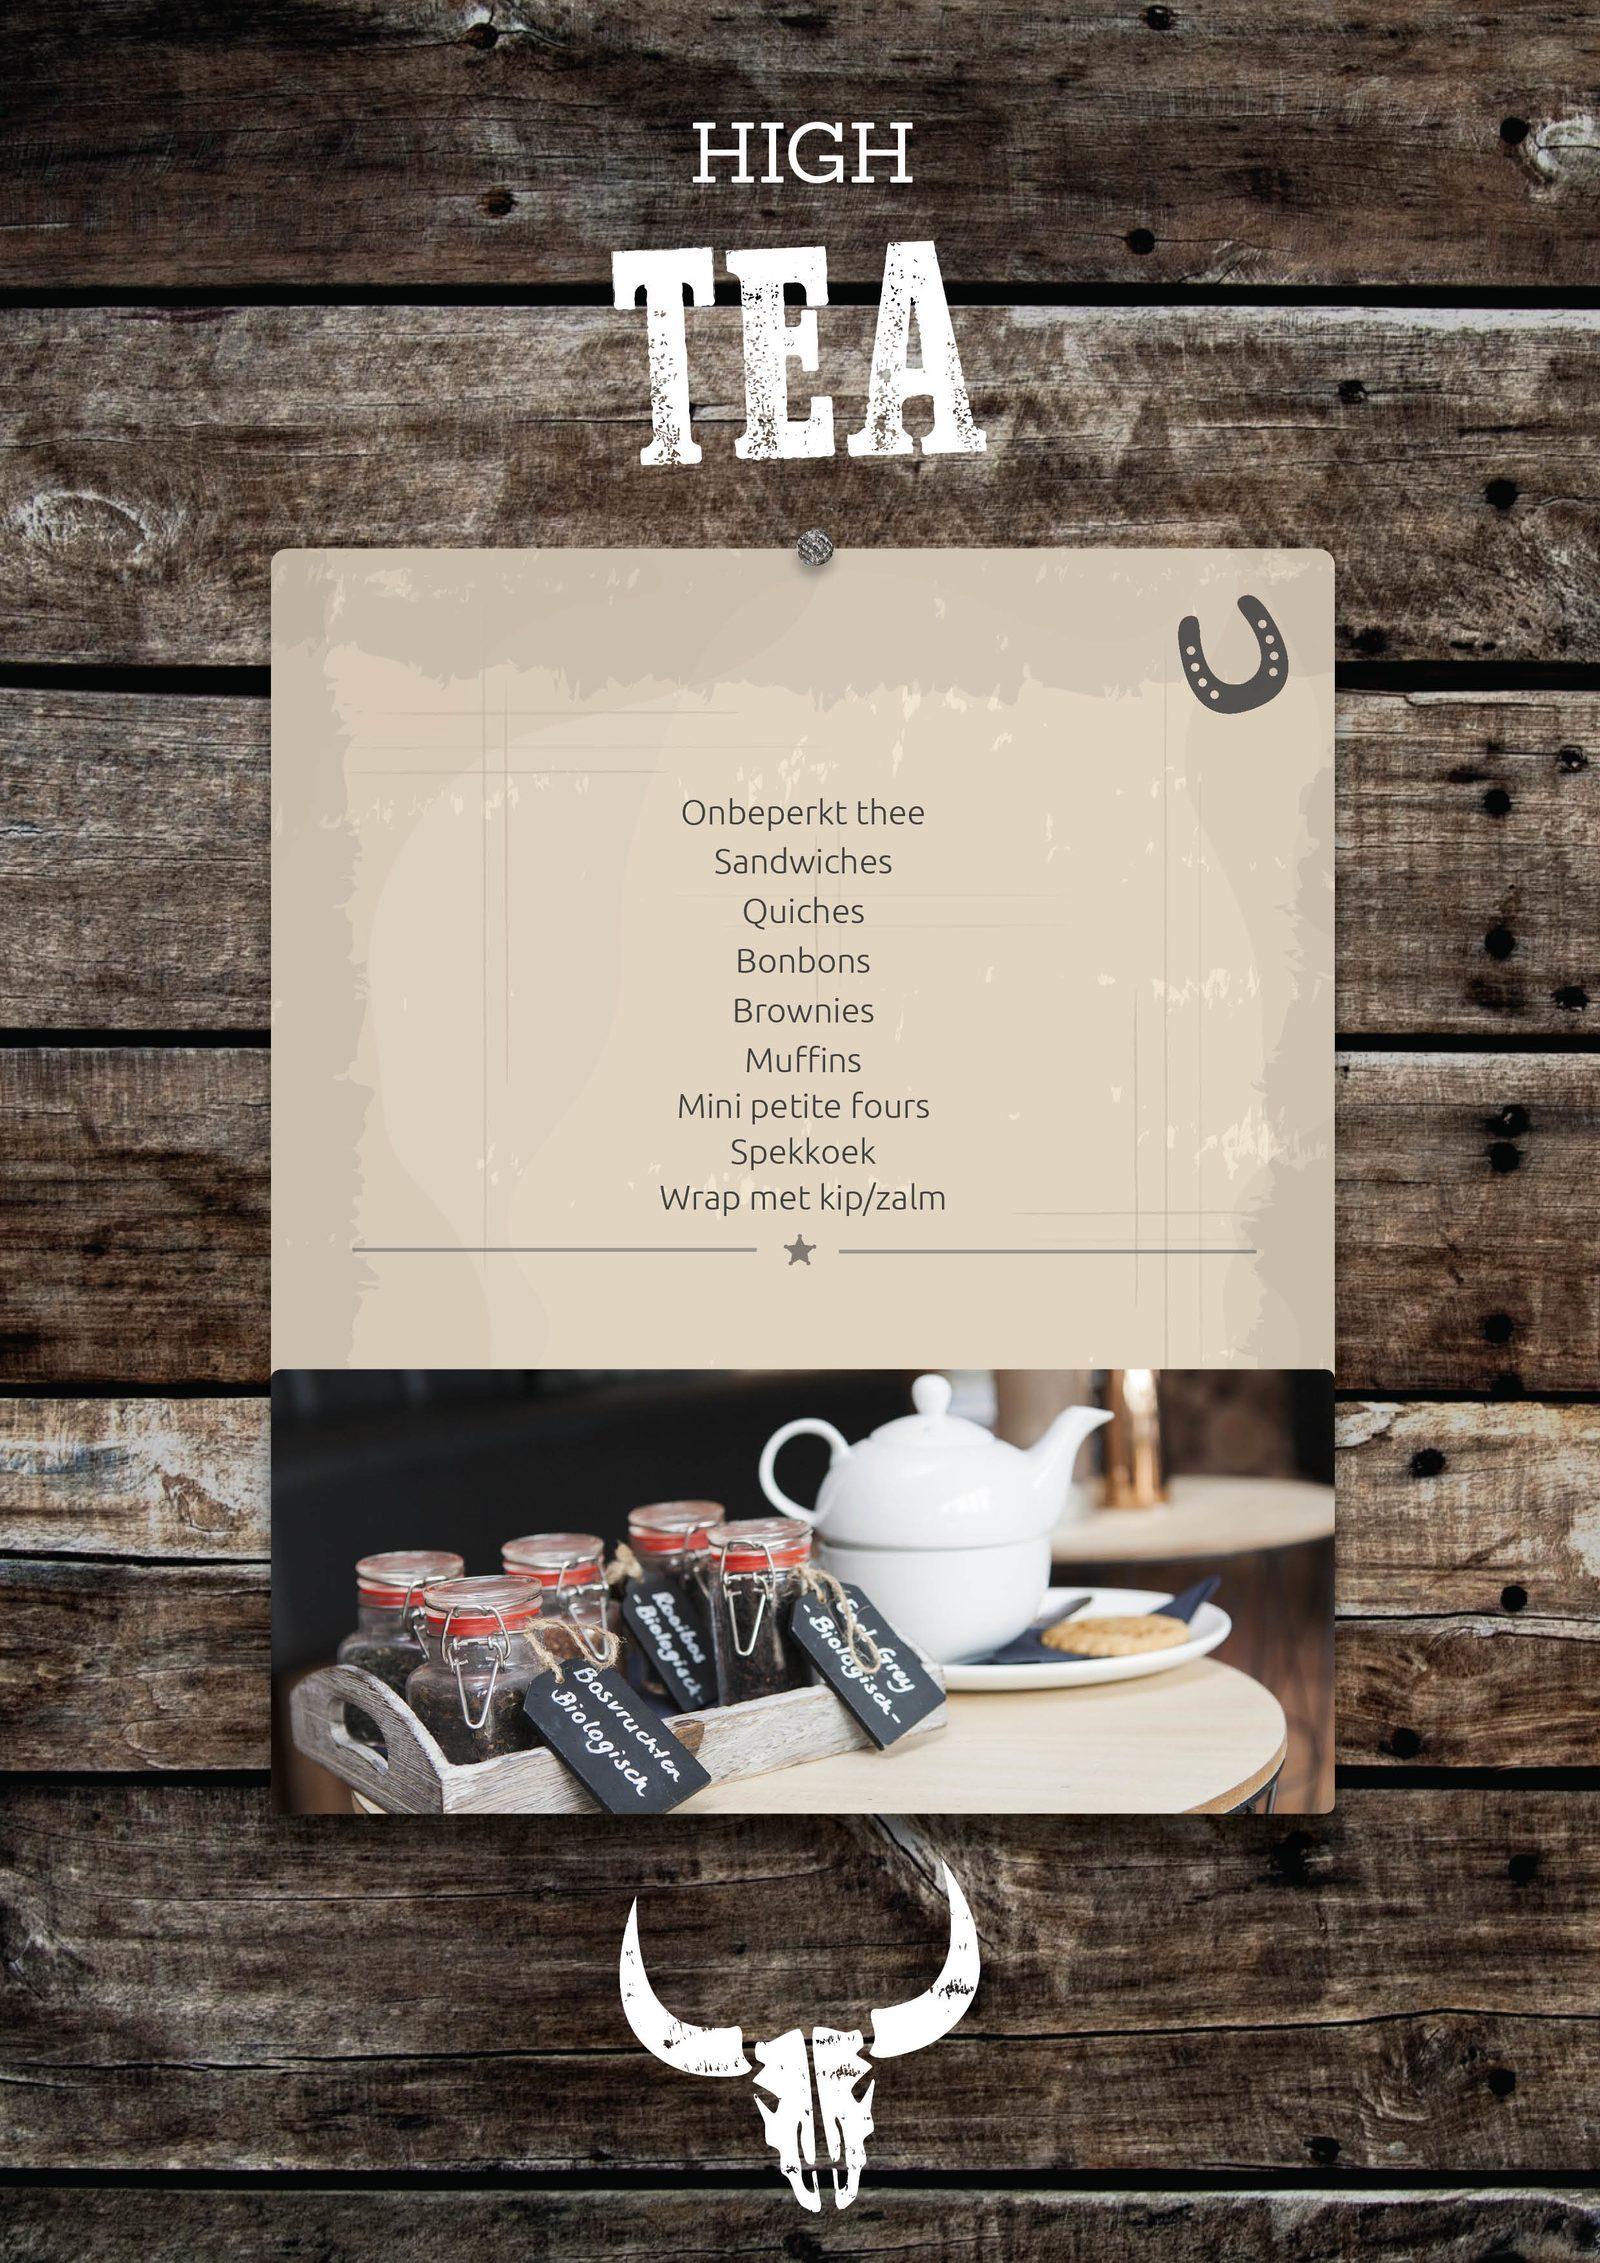 Bowling and High tea Events op de Veluwe